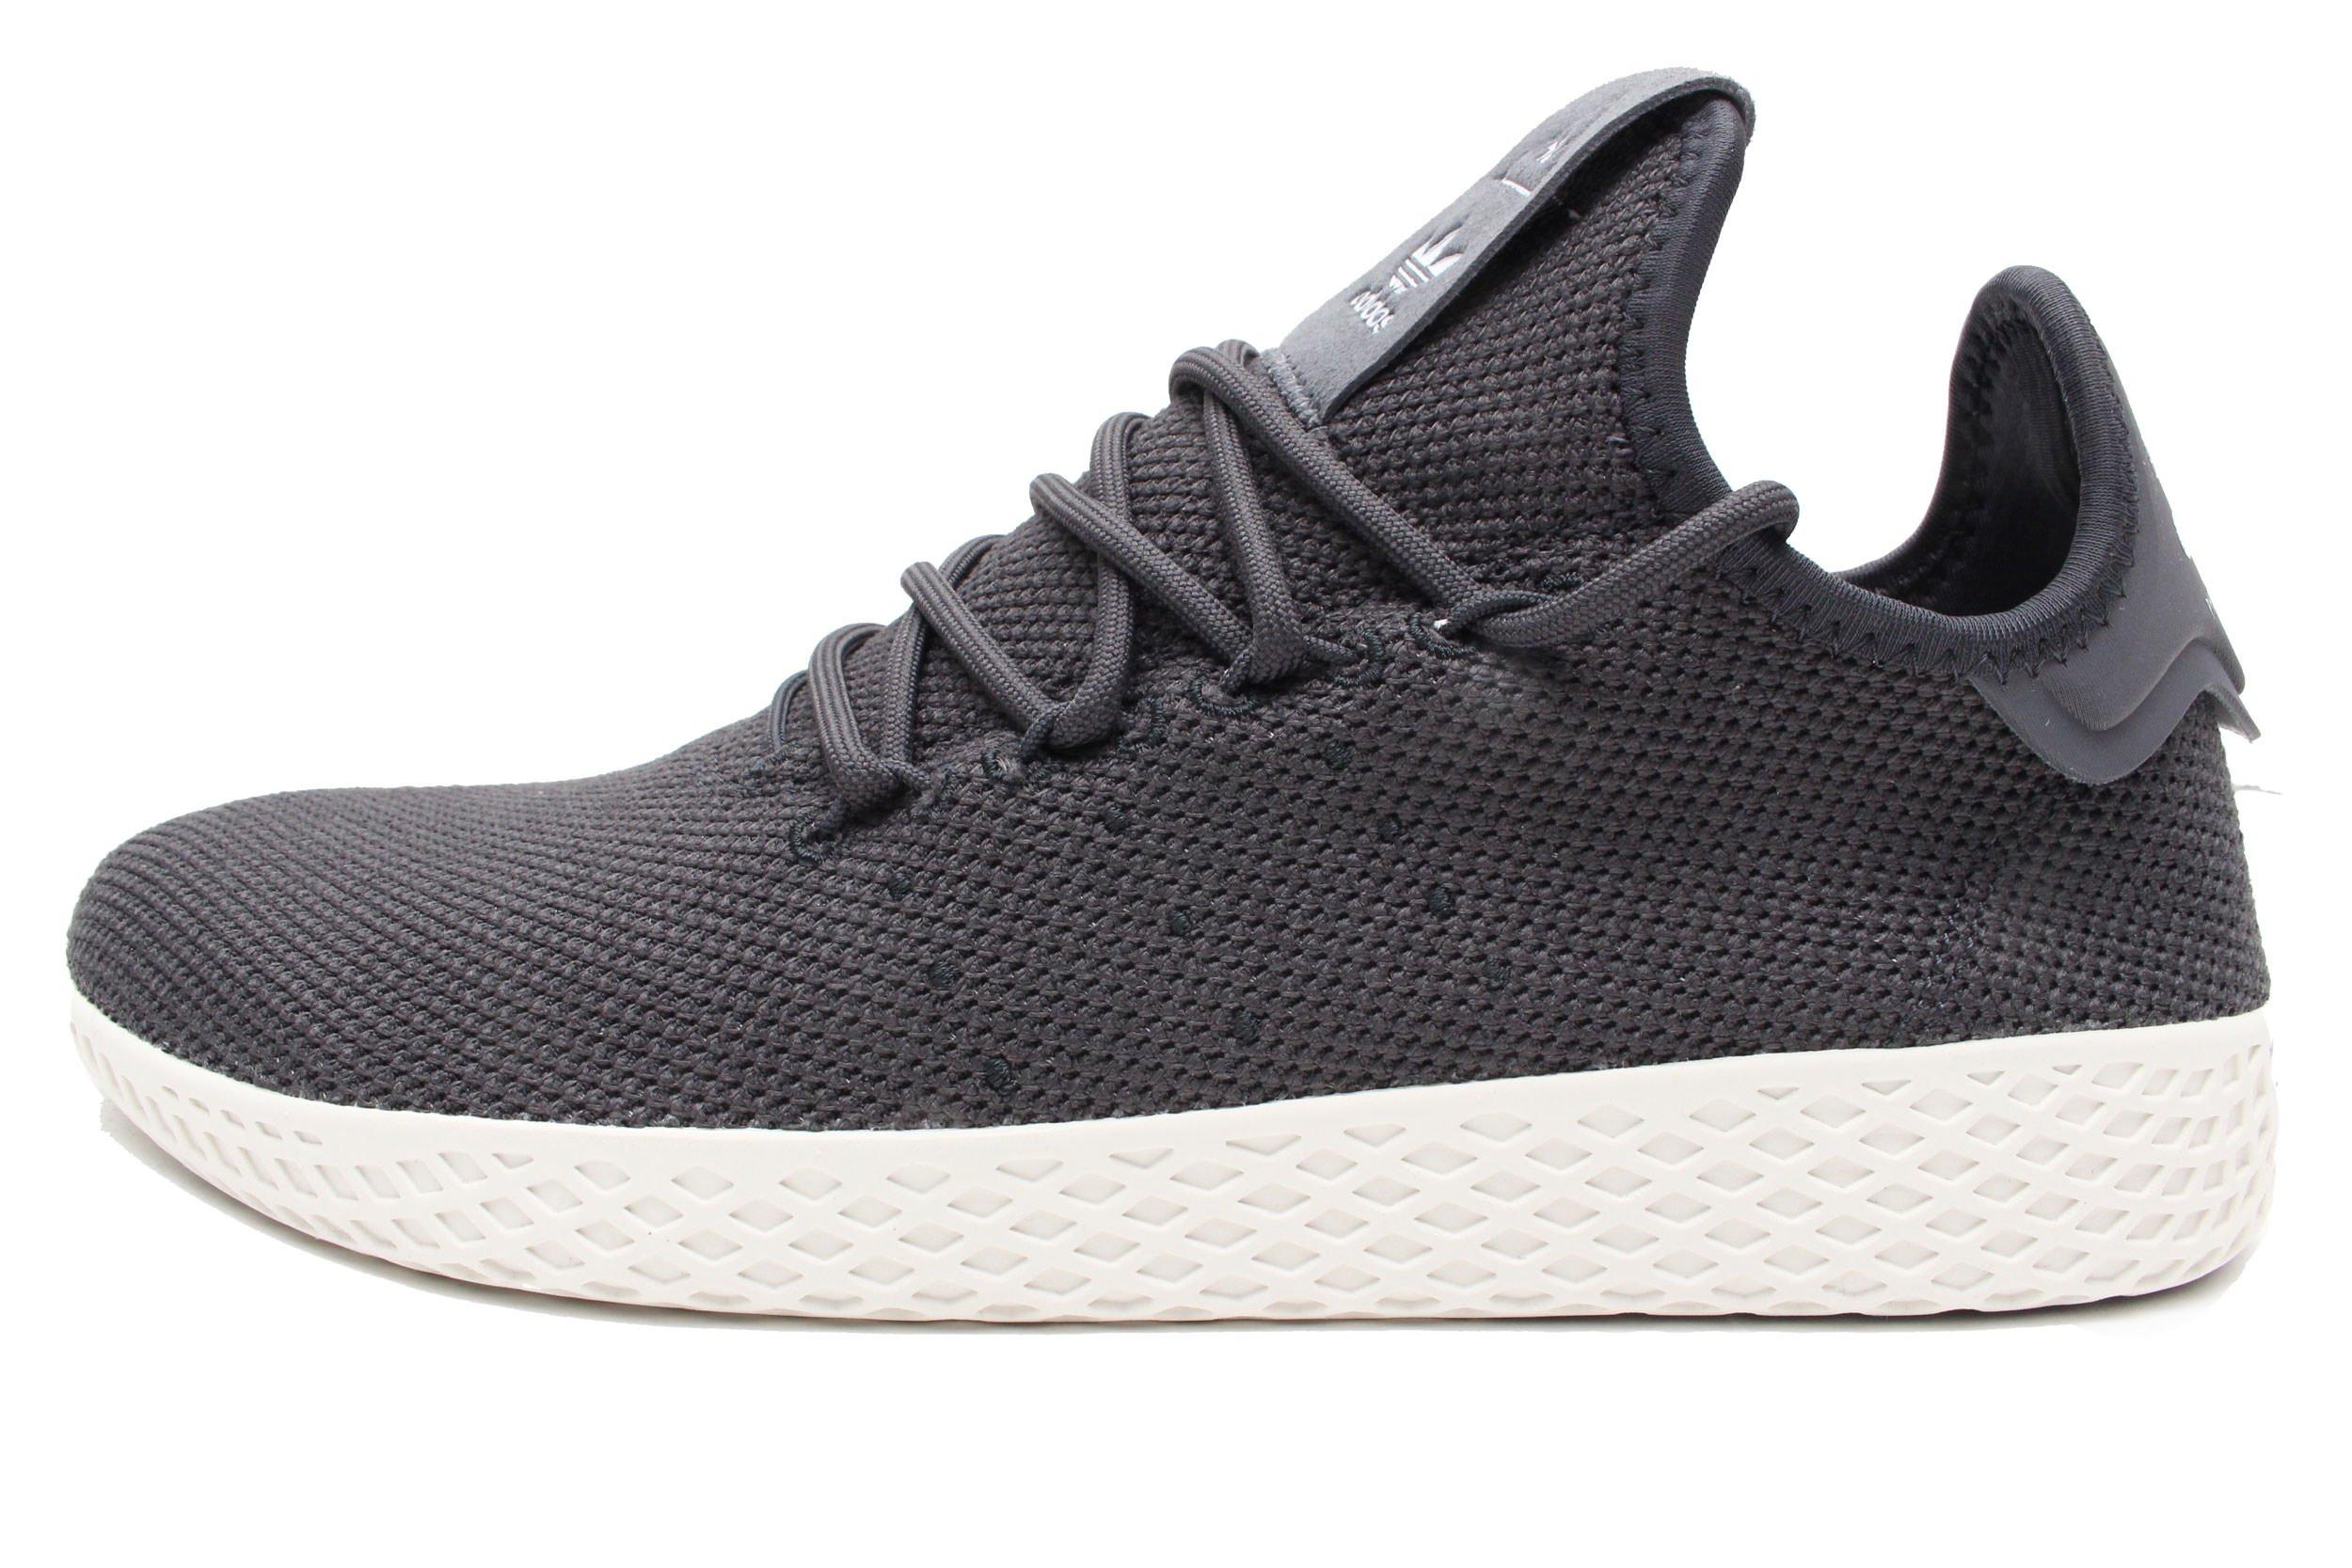 adidas Originals Men's Pharrell Williams Tennis HU Running Shoe Carbon/Chalk White, 4 Medium US